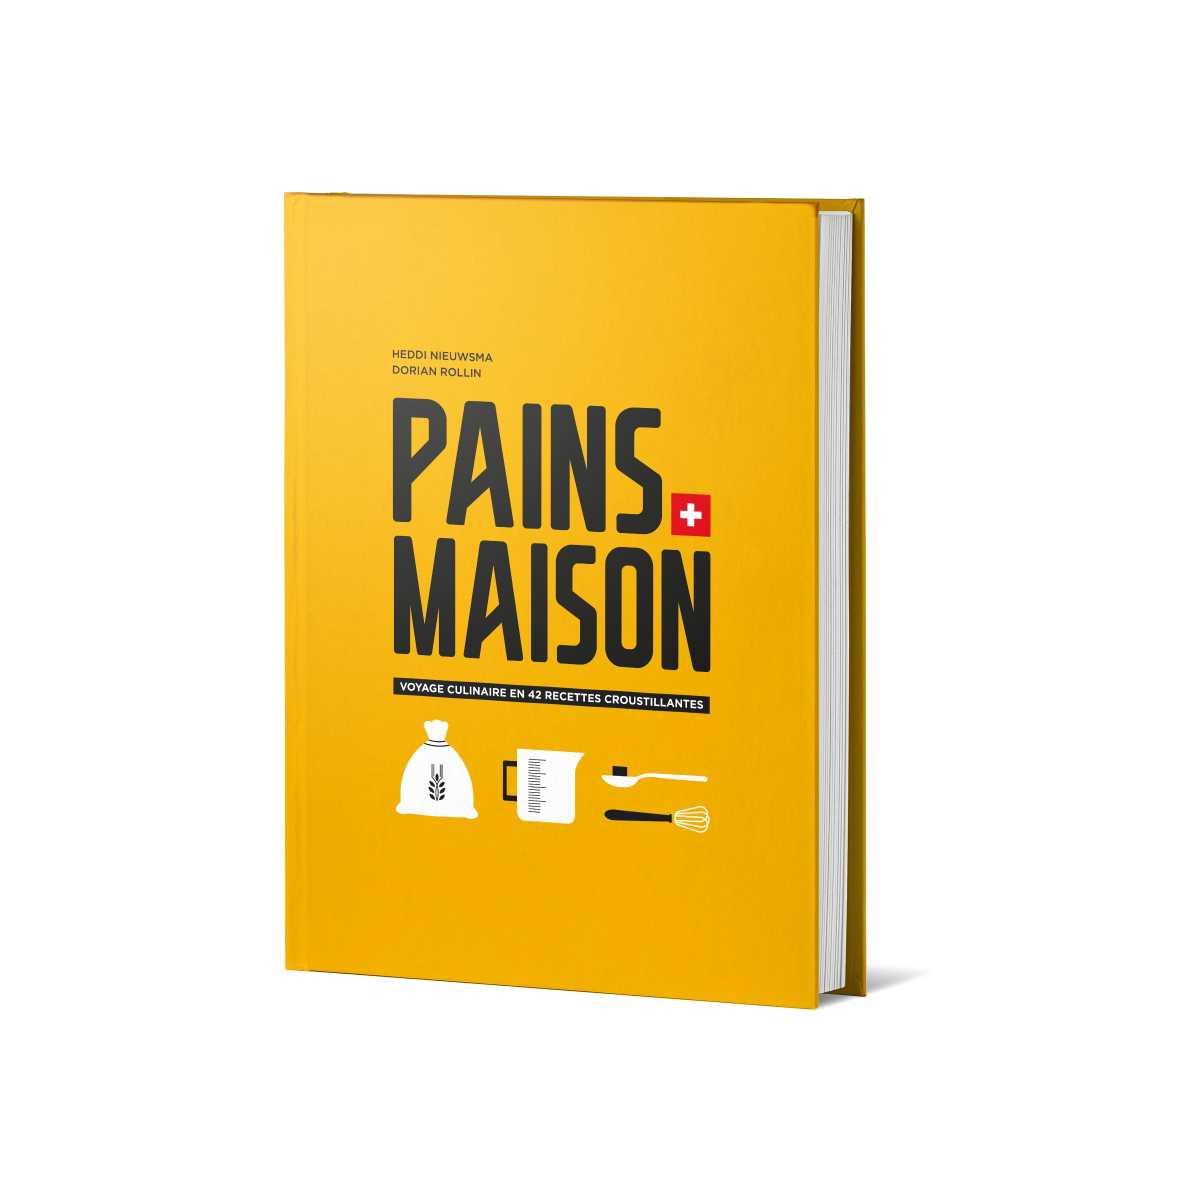 Pains Maison - Helvetiq - Livres - HELV05